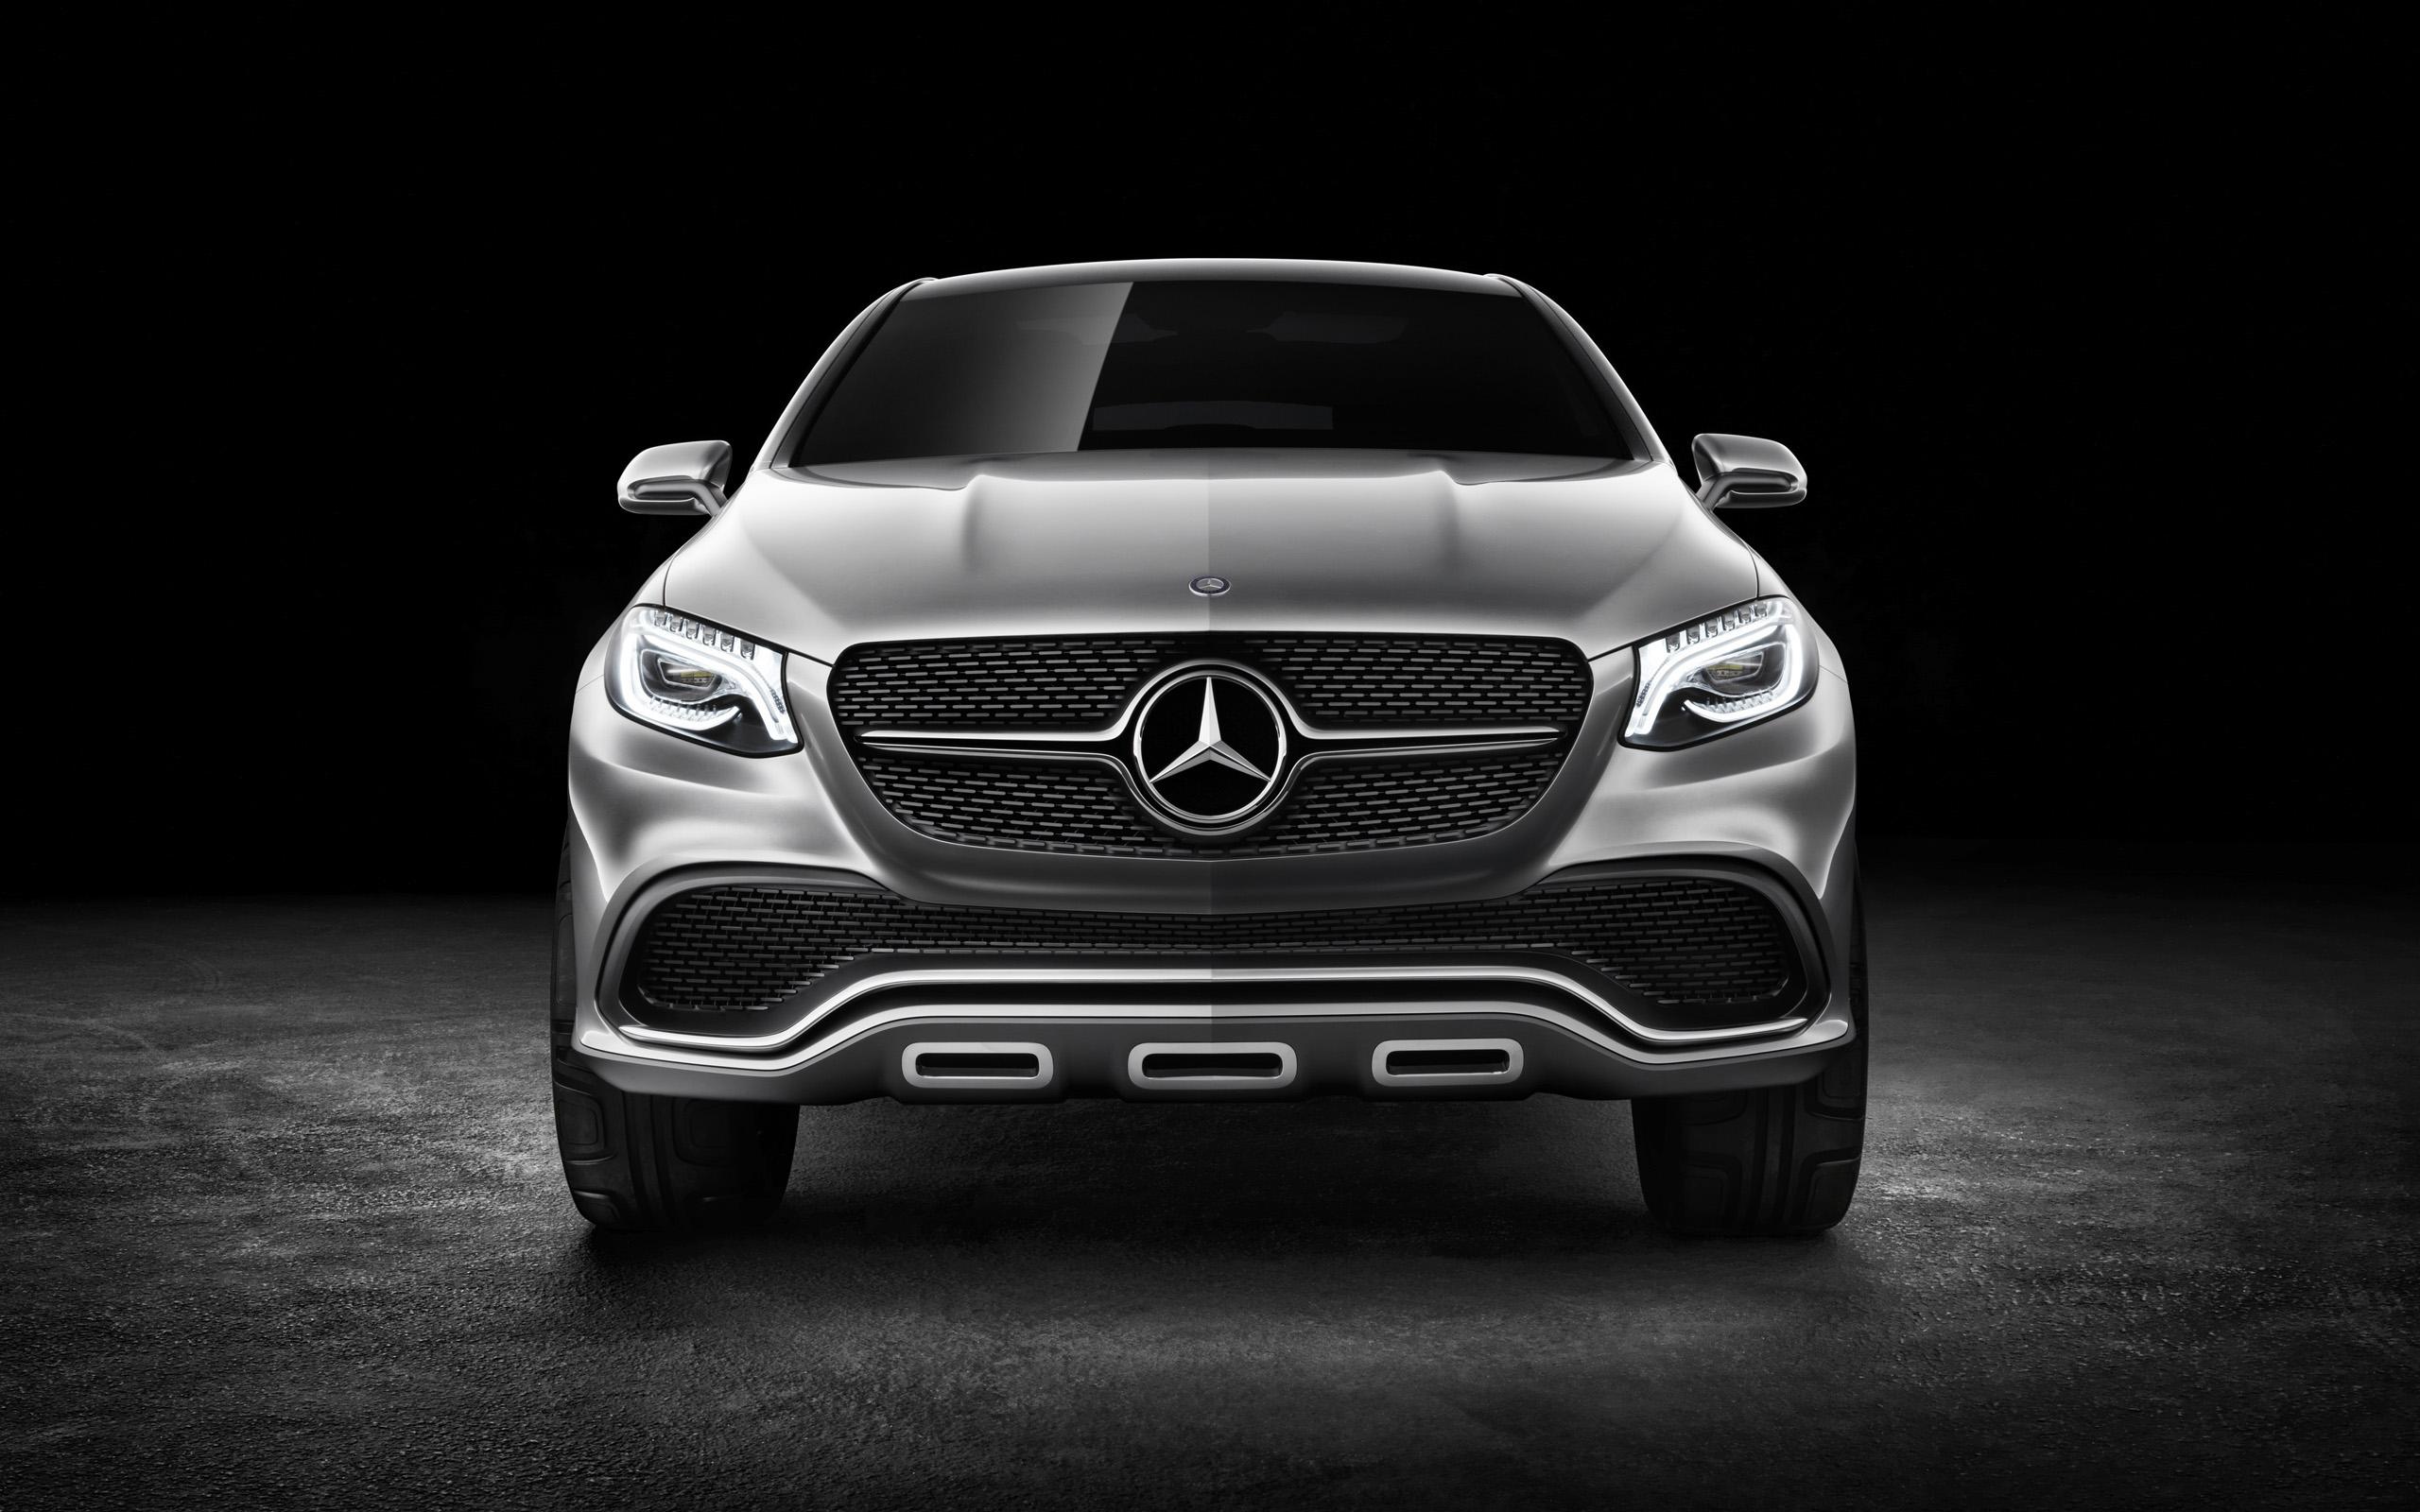 Bmw X6 Wallpaper Iphone 2014 Mercedes Benz Concept Coupe Suv 8 Wallpaper Hd Car